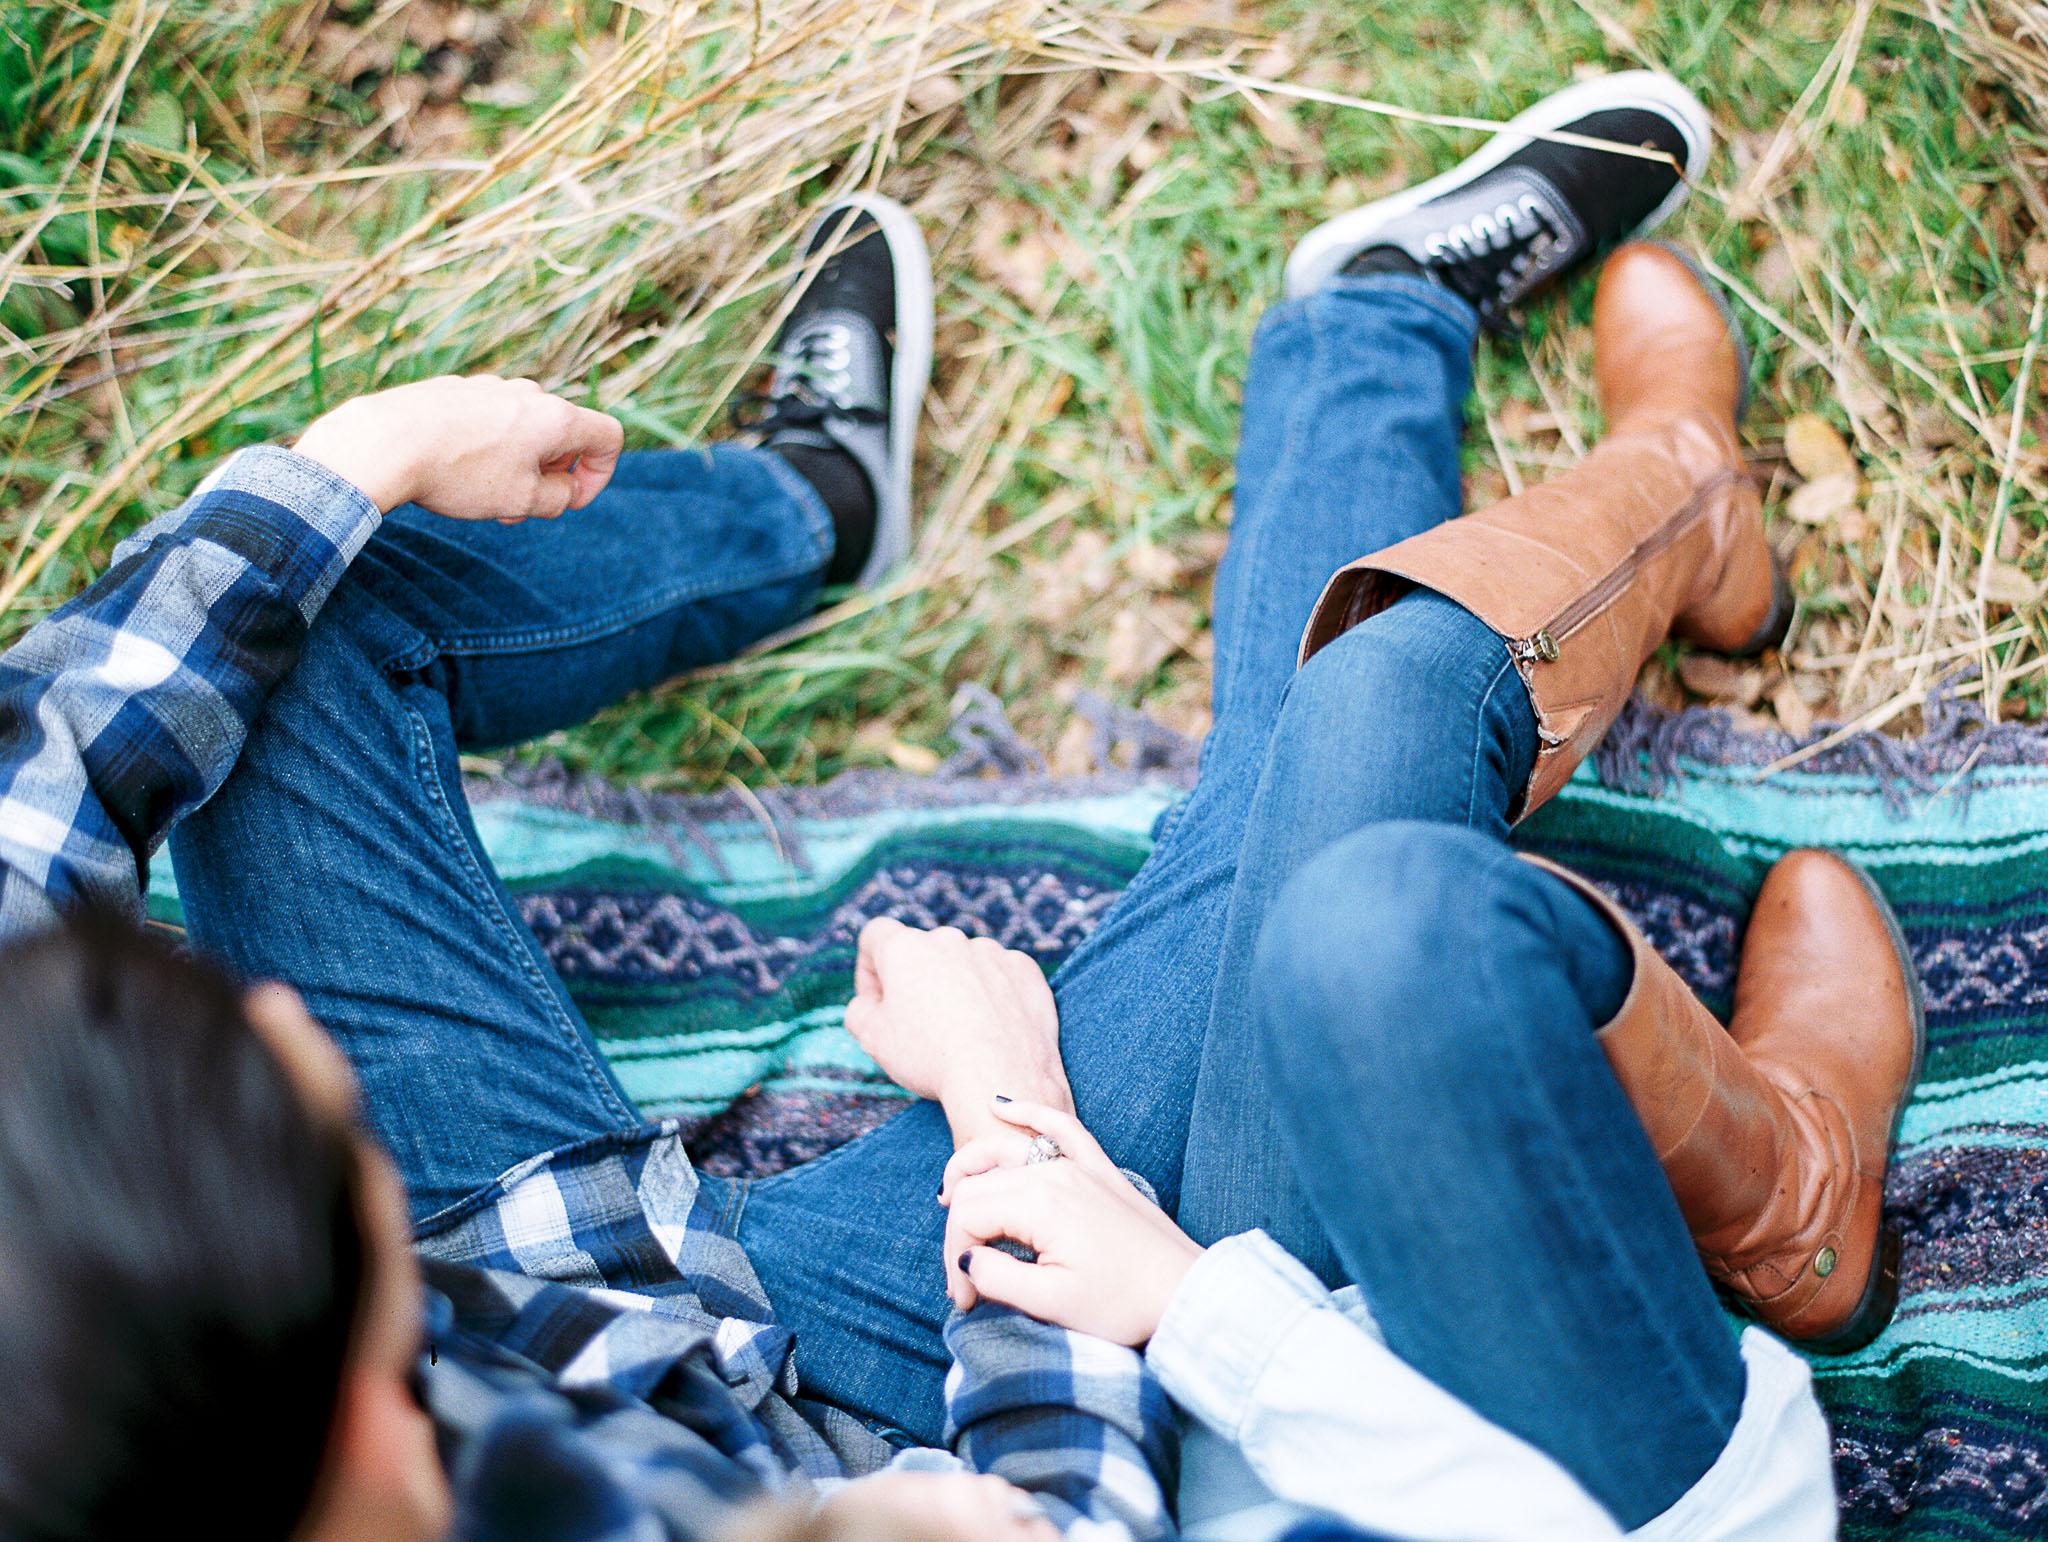 alyssa-nikole-photography-engagement-Austin-Mckinny-falls-20.jpg